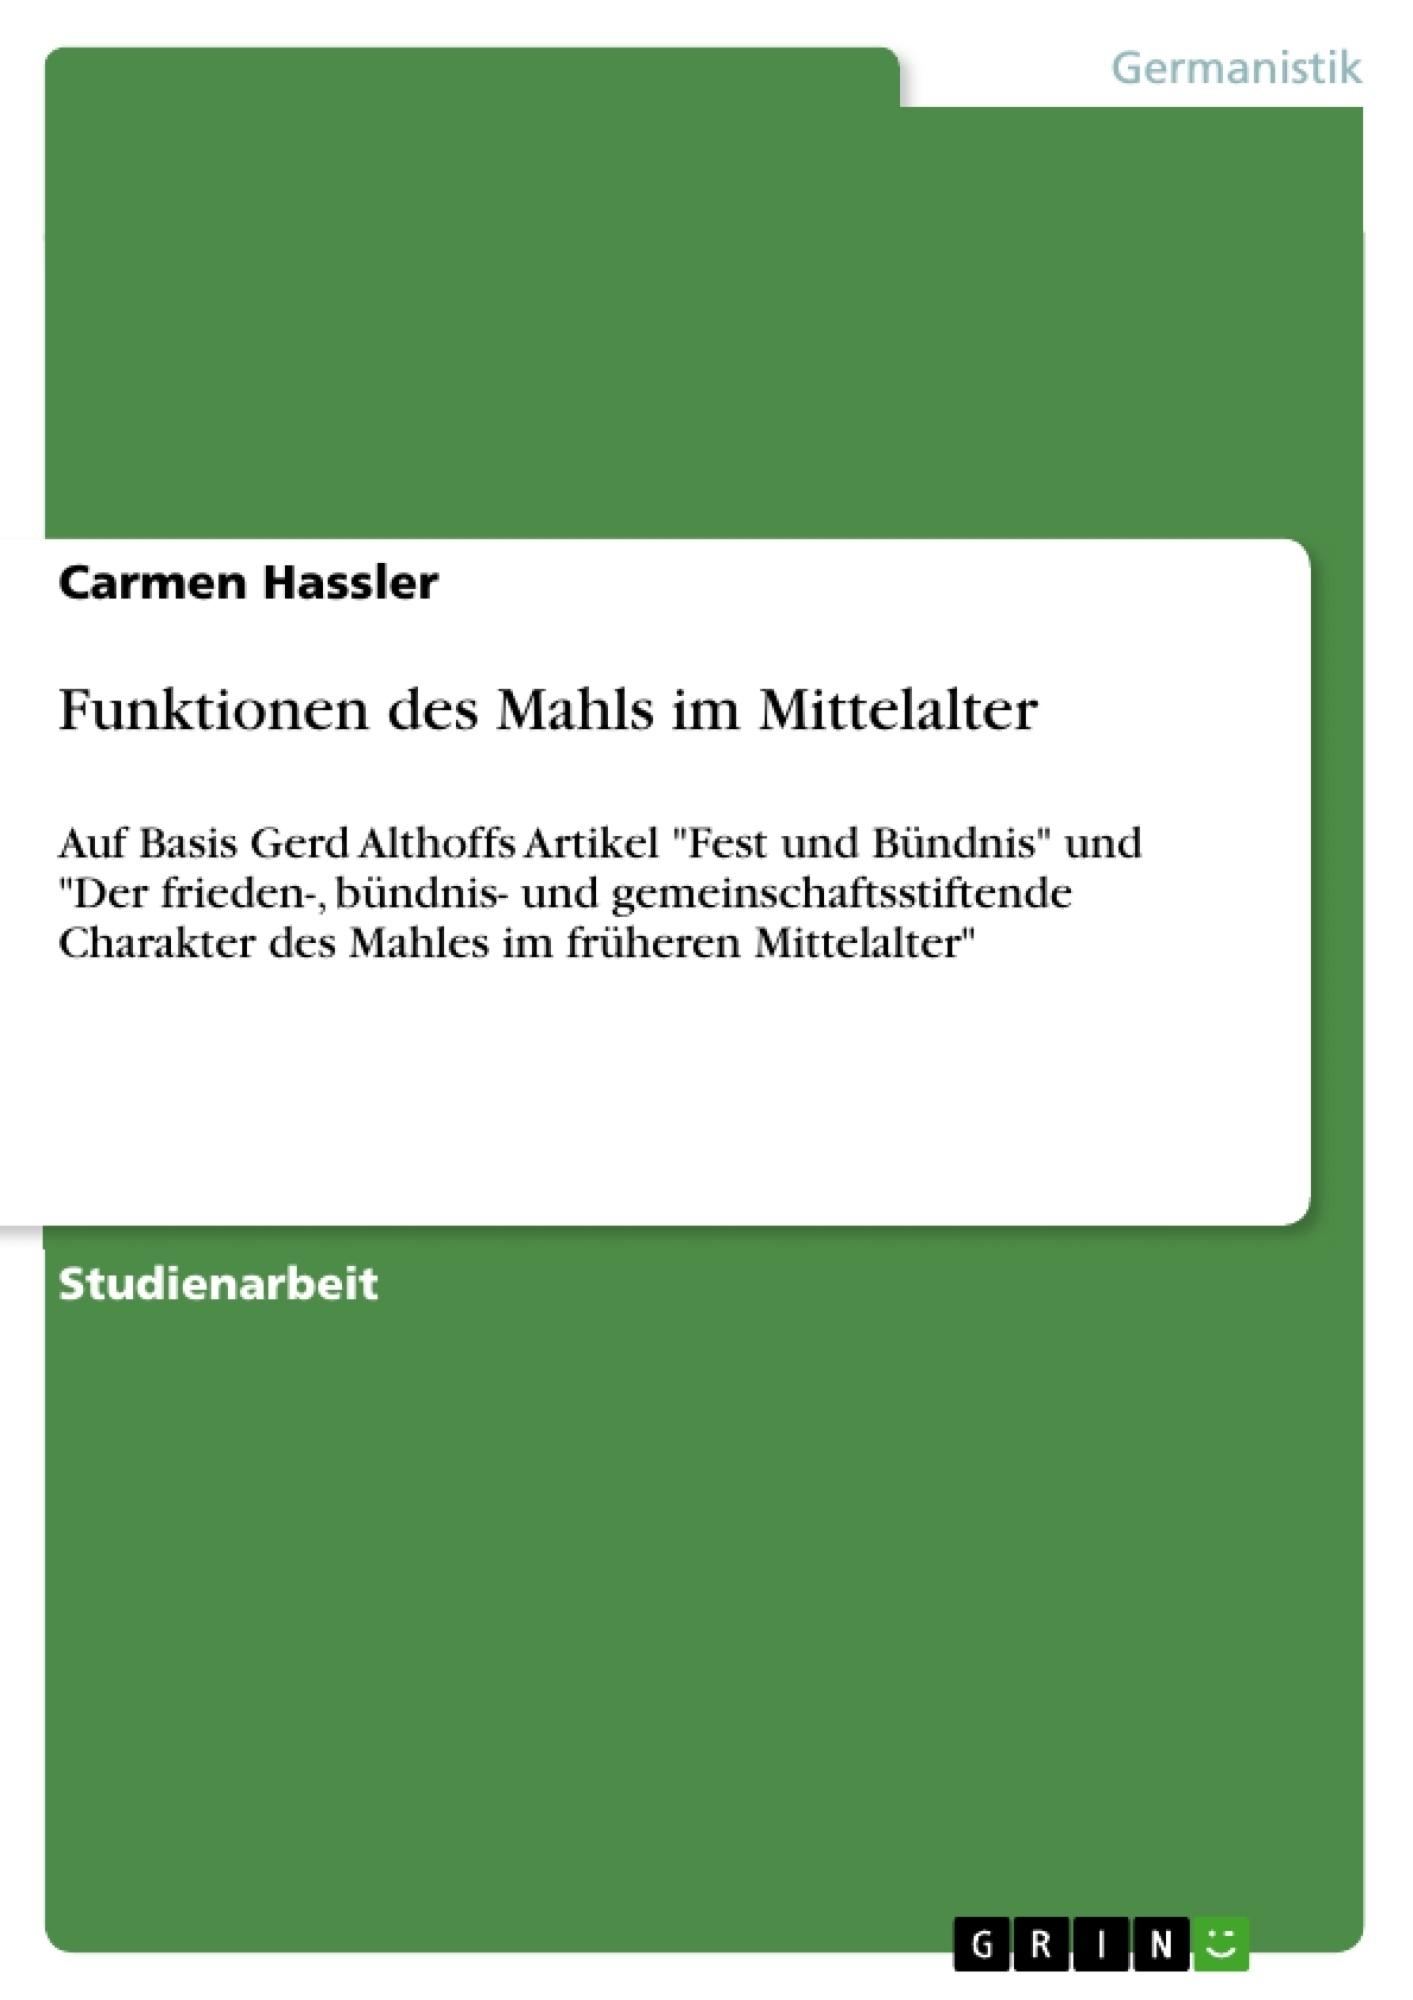 Titel: Funktionen des Mahls im Mittelalter